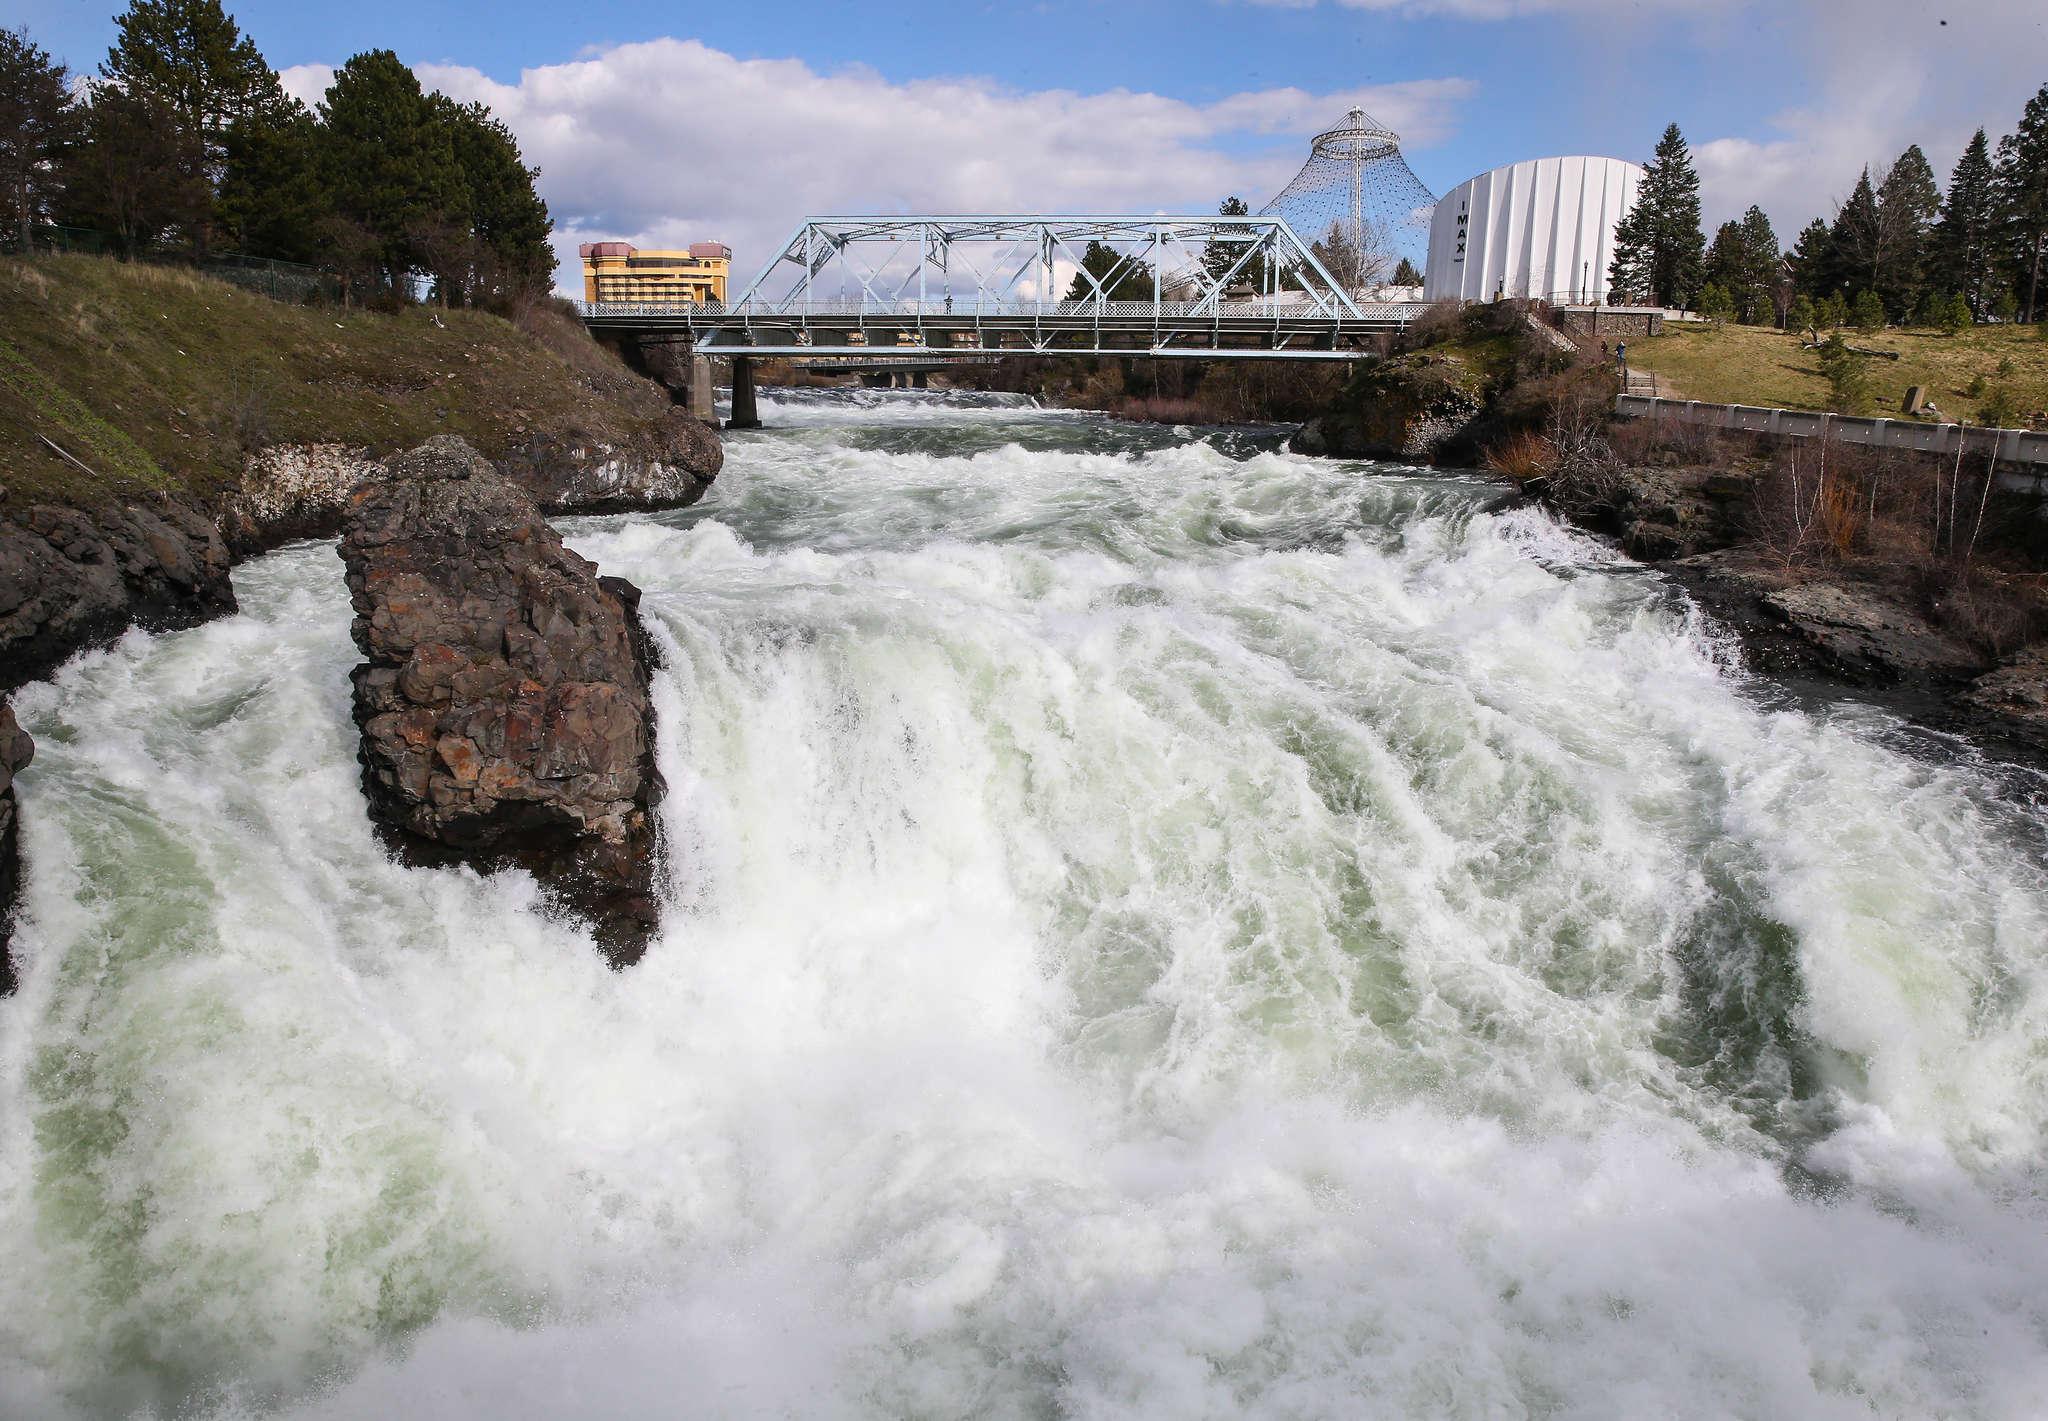 The Spokane Falls roar through the city. STEVEN M. FALK / Staff Photographer